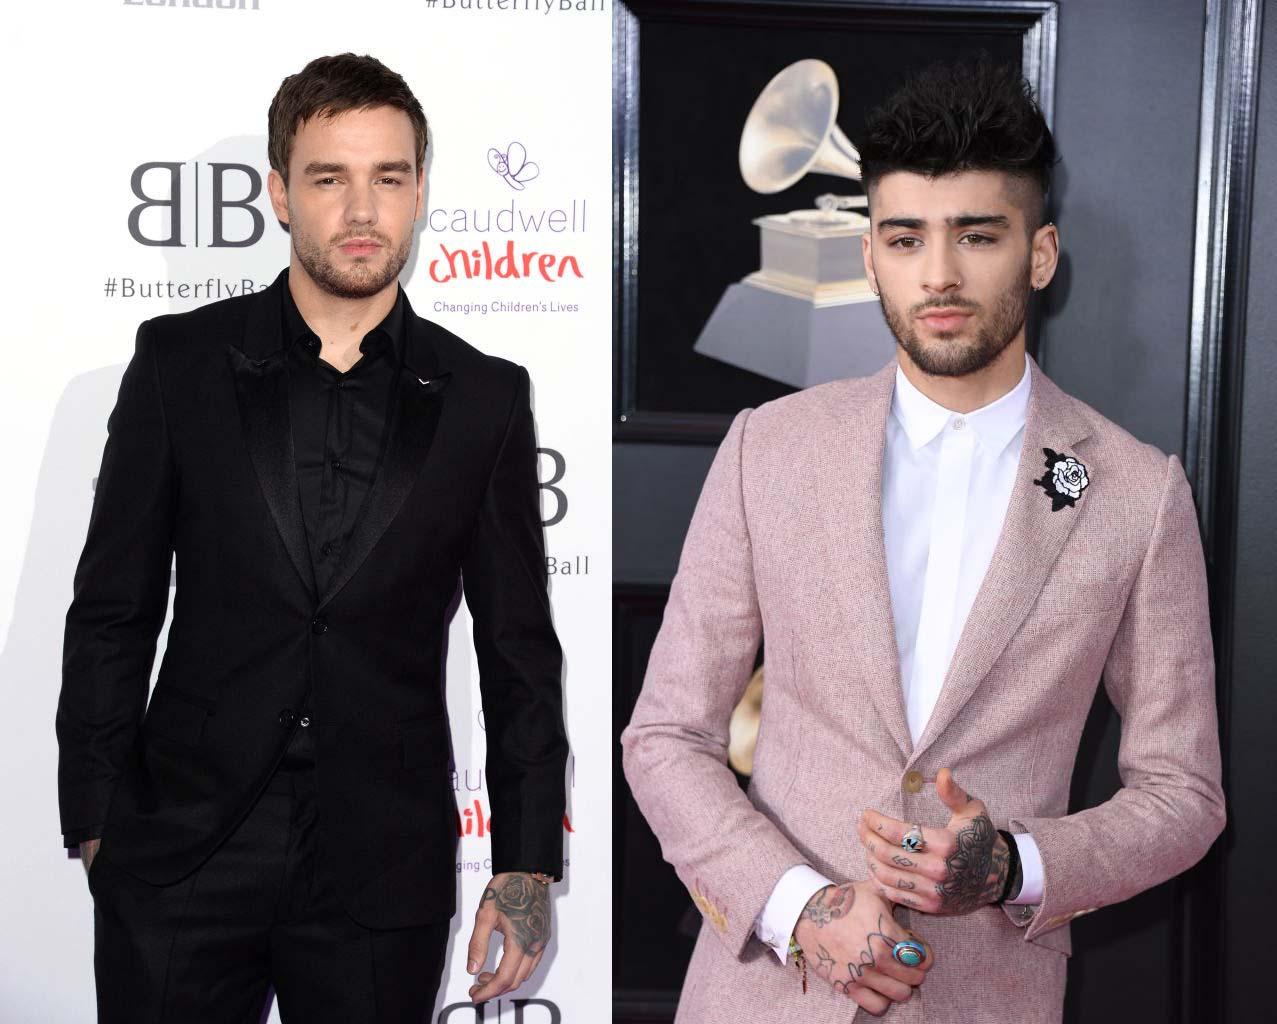 Liam Payne Hilariously Recreates One Direction? Singer Makes TikTok Video About Former Member Zayn Malik